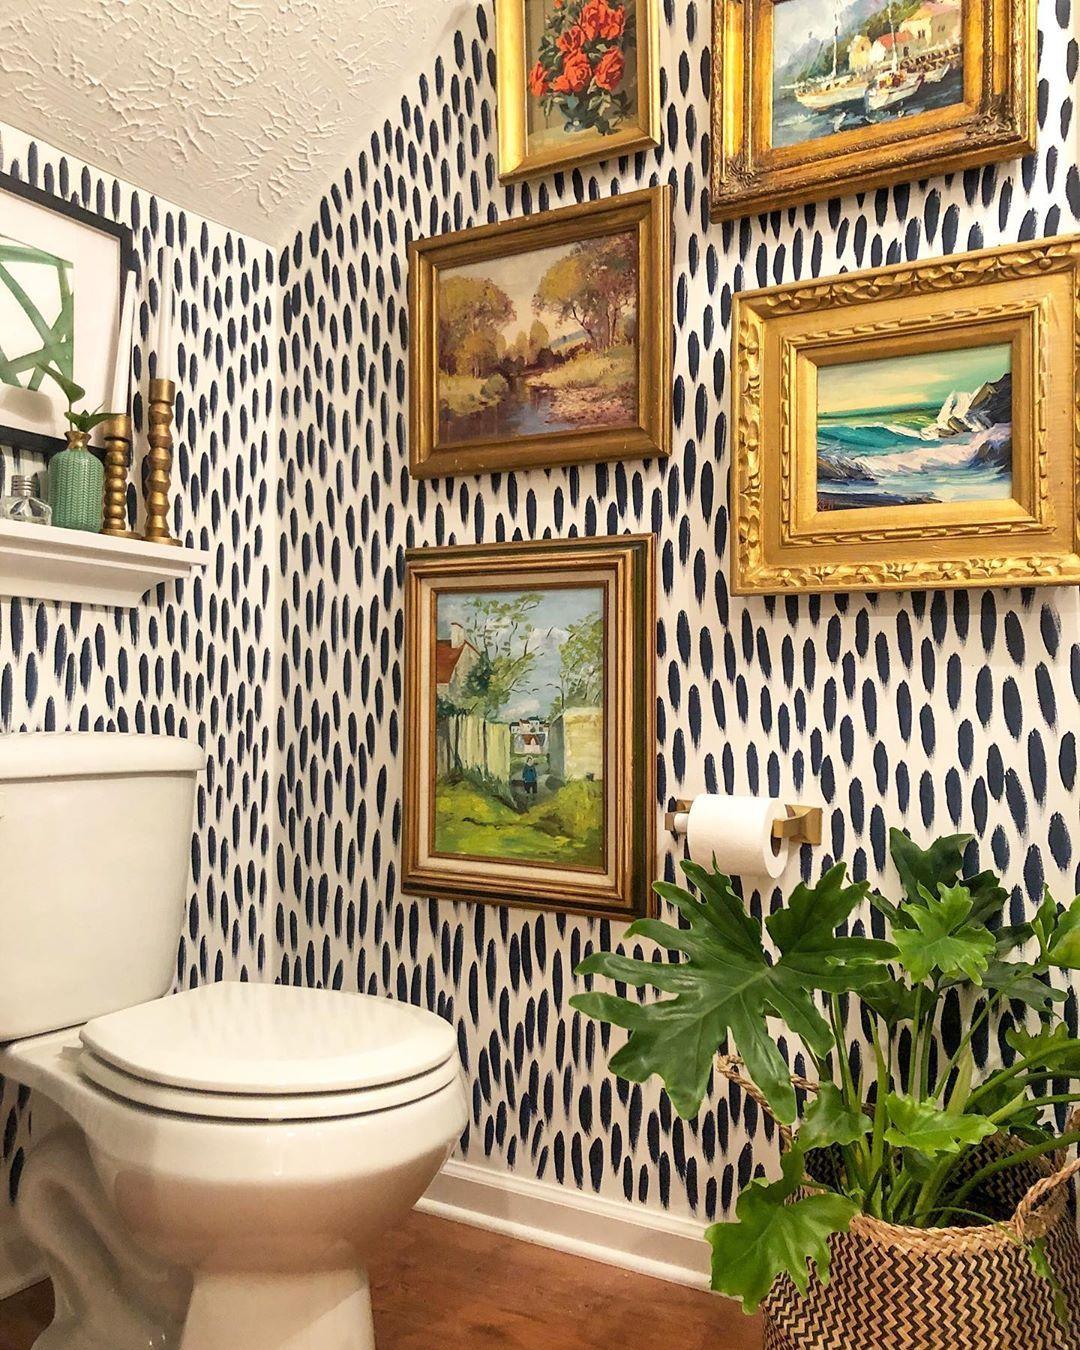 22 Of The Most Gorgeous Half Bath Ideas We Ve Ever Seen Powder Room Decor Half Bathroom Decor Powder Room Small Folk art bathroom decor